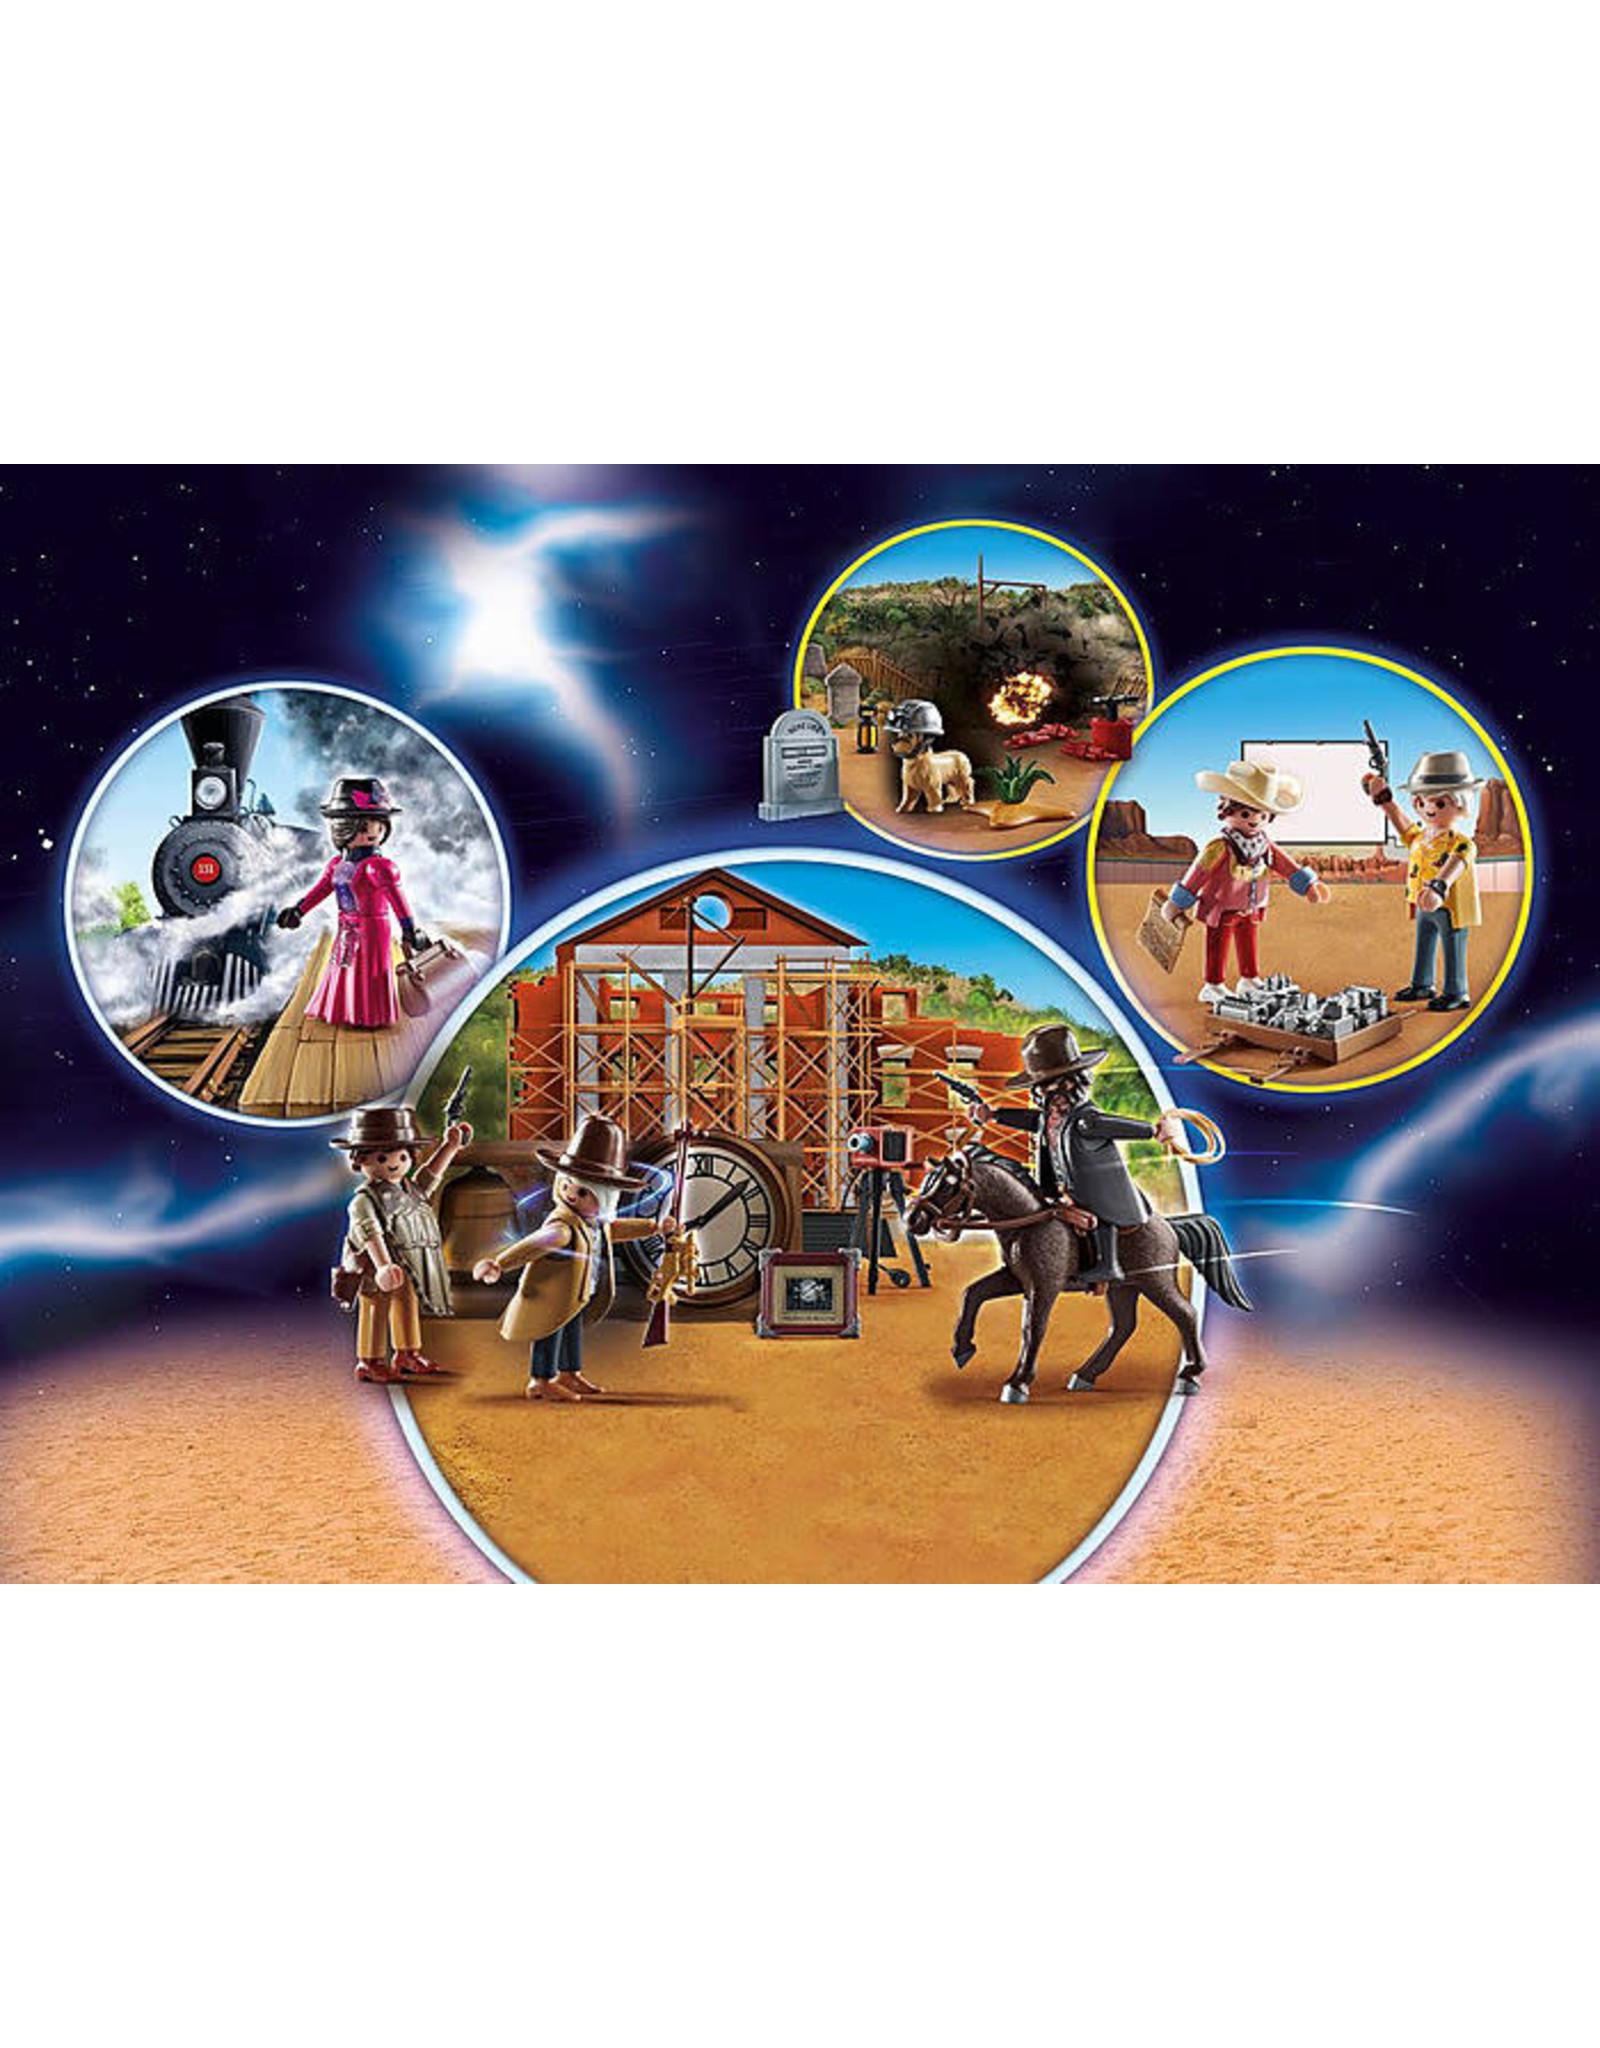 Playmobil Advent Calendar Back to the Future III Western